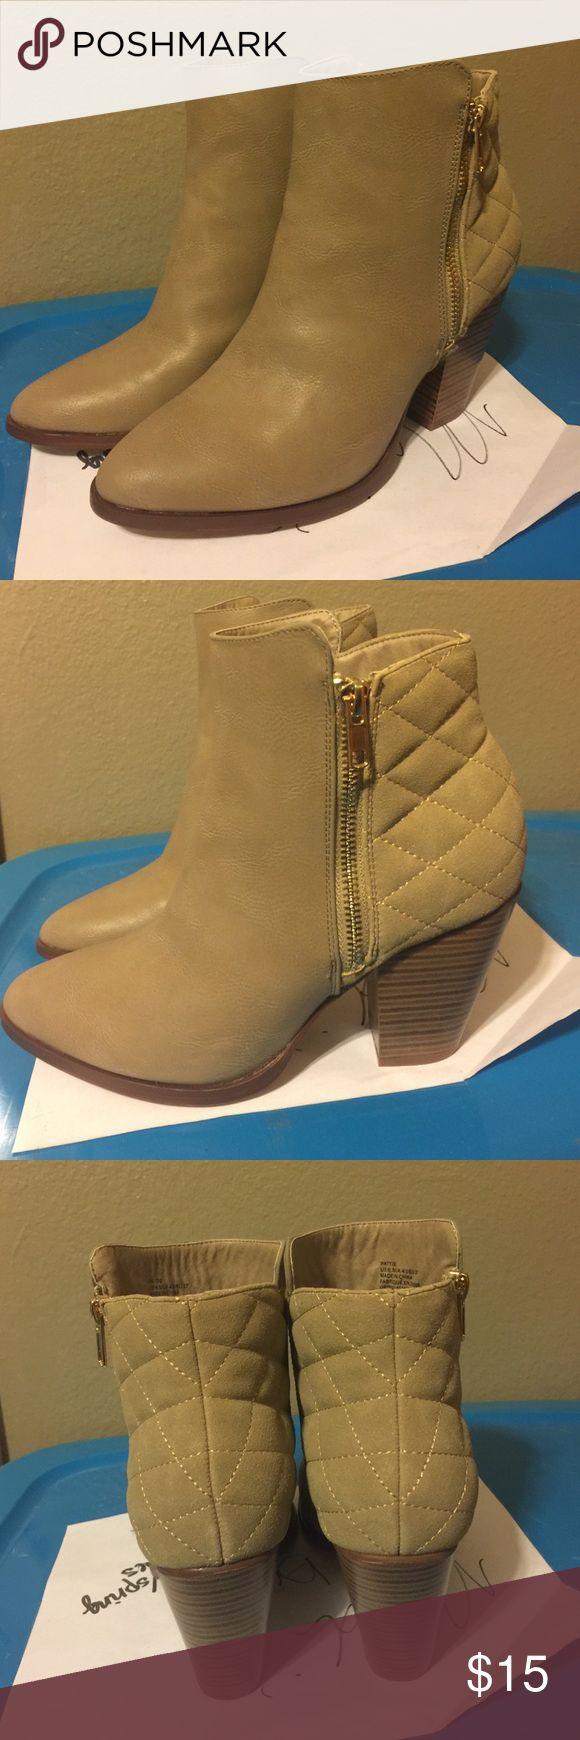 Shoe Dazzle Booties Tan Size 6.5 Shoe Dazzle Booties NEVER WORN. Super comfy. Shoe Dazzle Shoes Ankle Boots & Booties